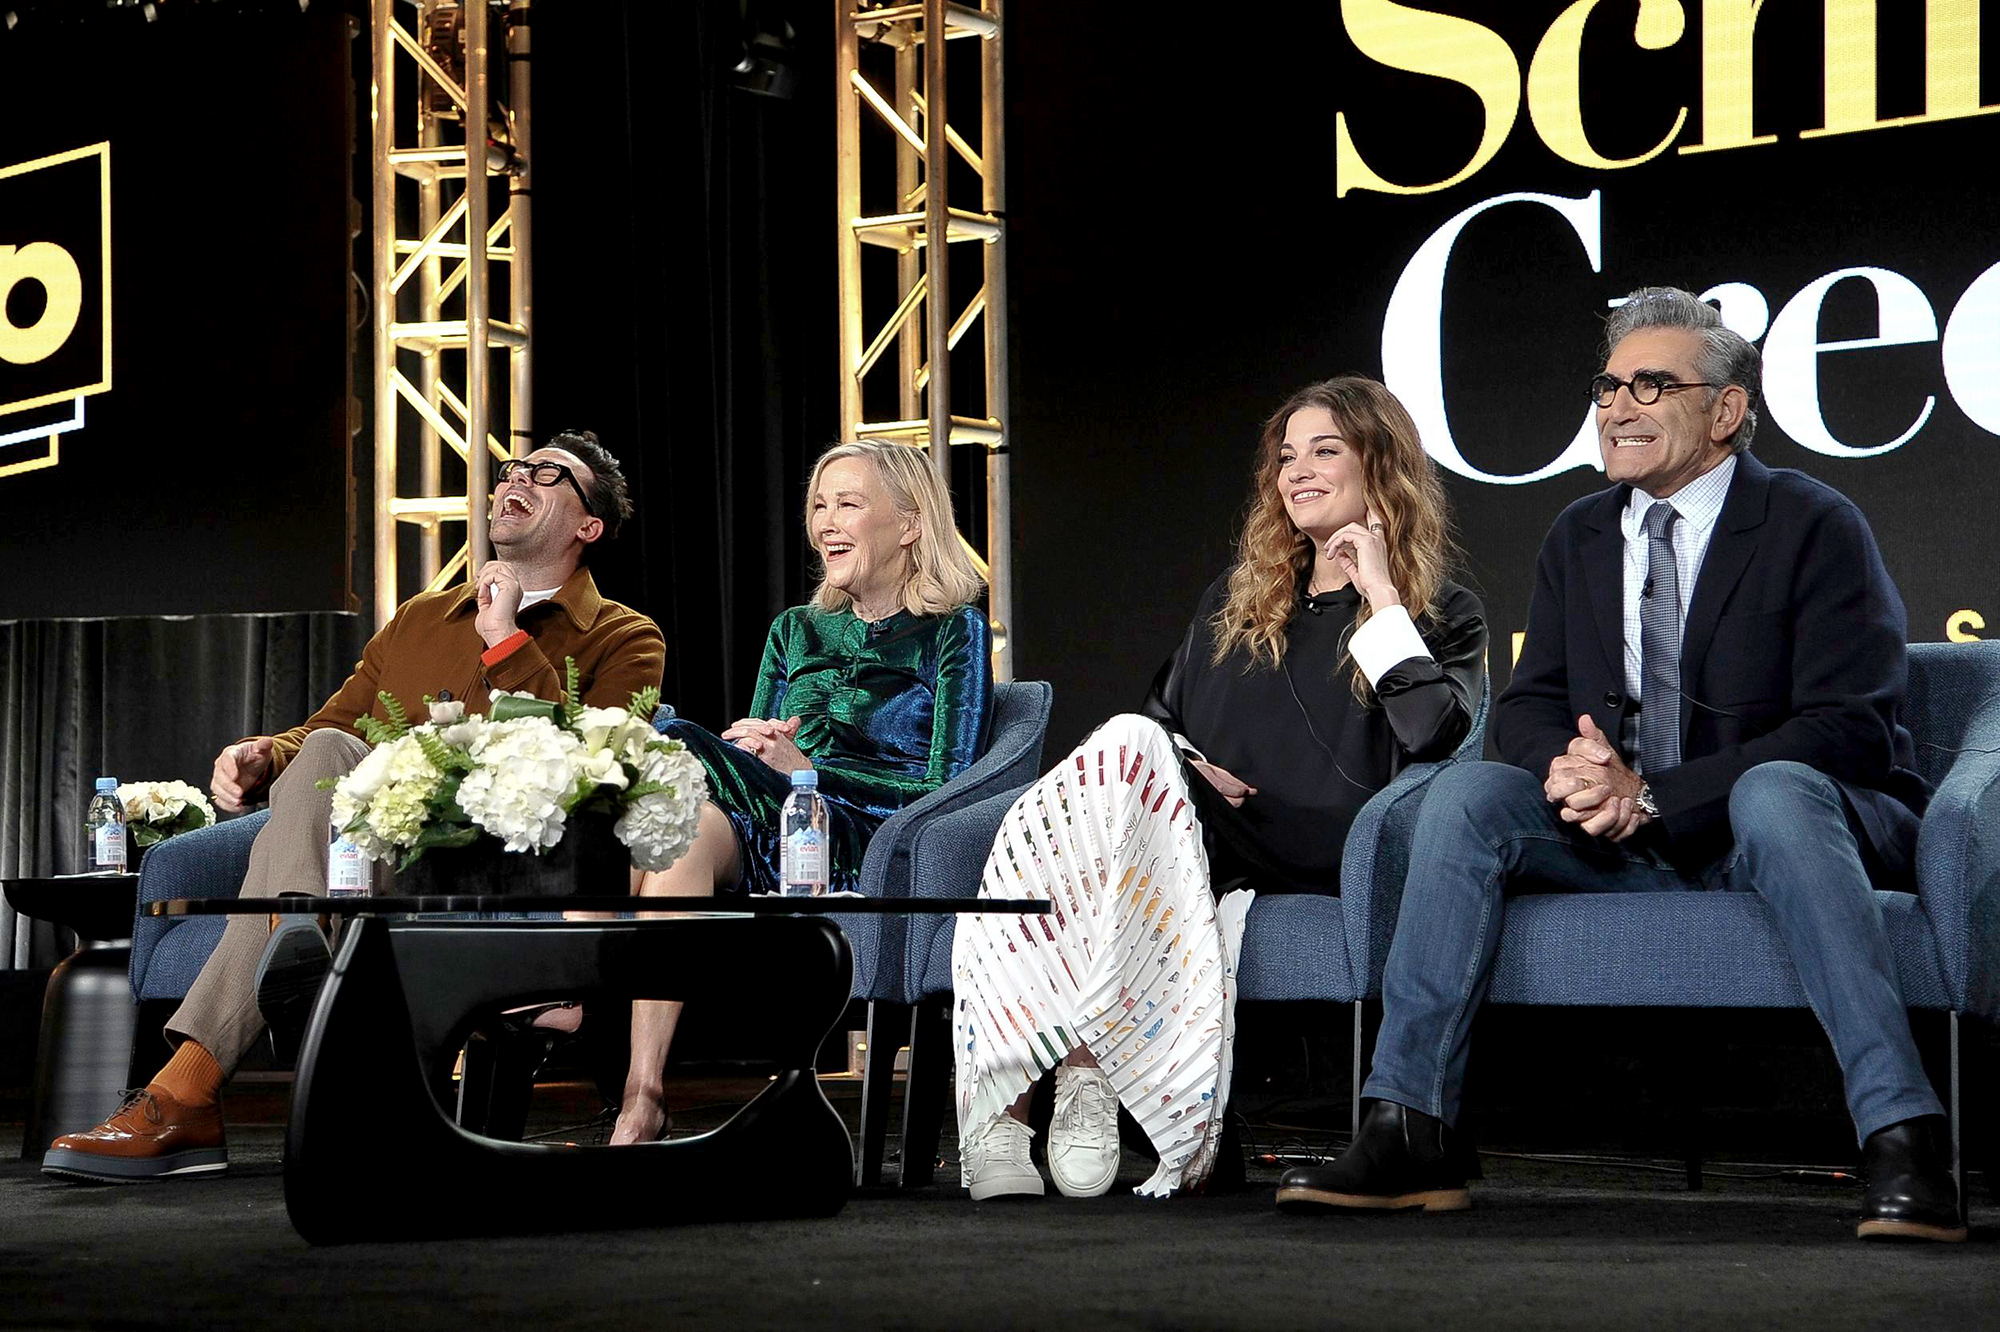 Catherine O'Hara Reflects on the Final Season of 'Schitt's Creek': 'They Really Wrapped Up Beautifully'